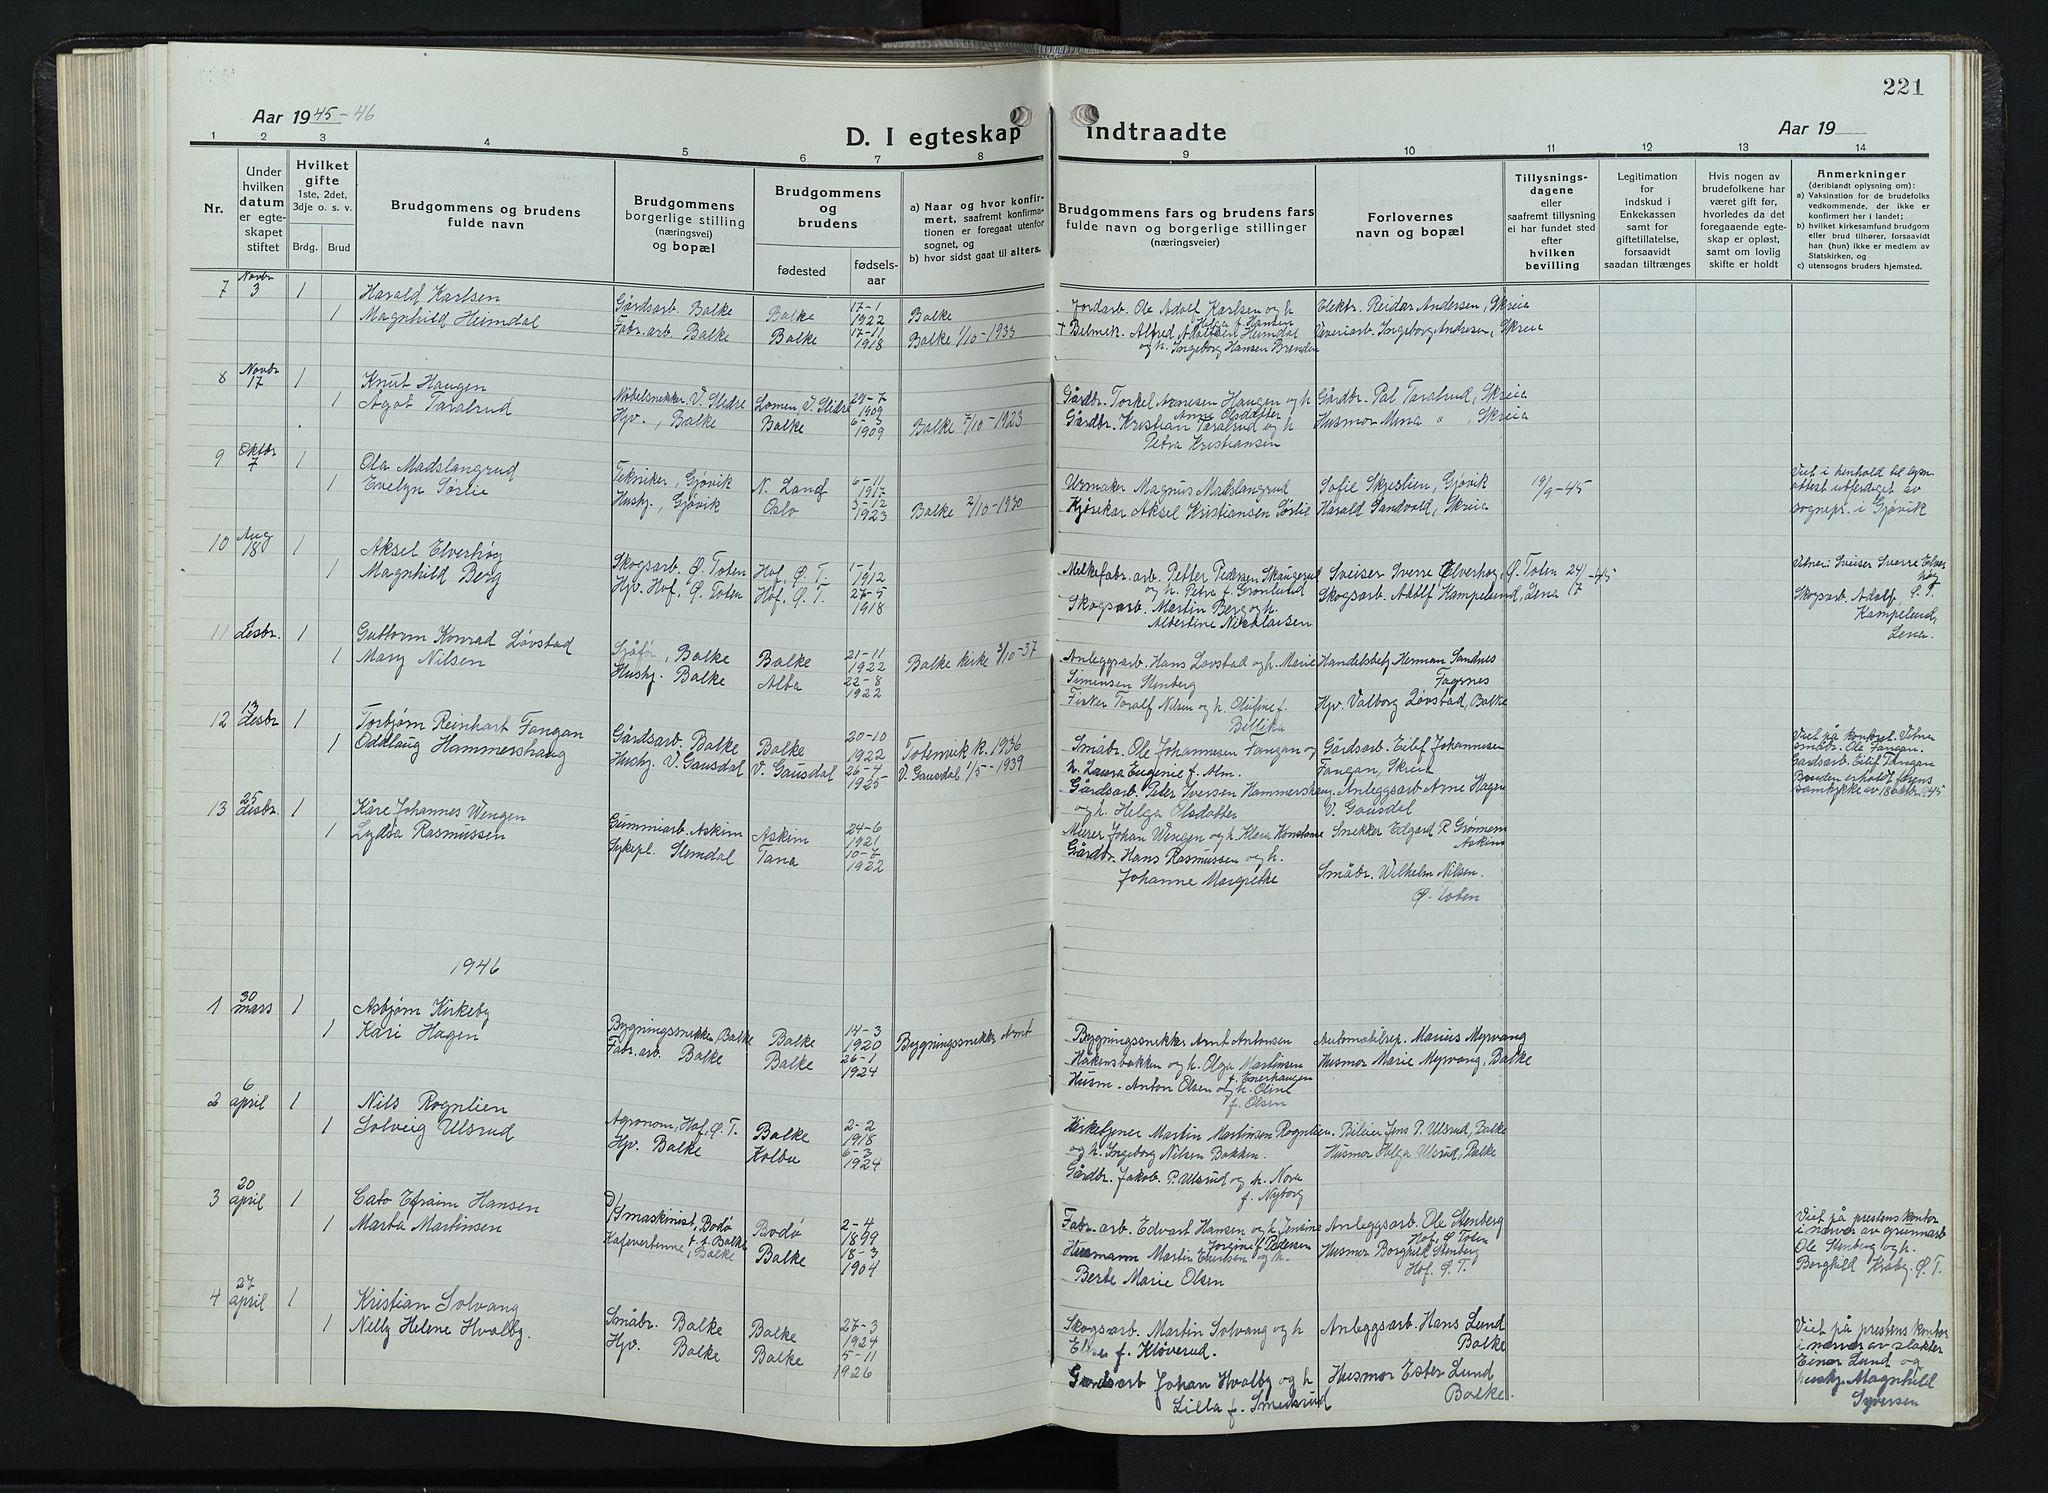 SAH, Balke prestekontor, Klokkerbok nr. 1, 1920-1955, s. 221